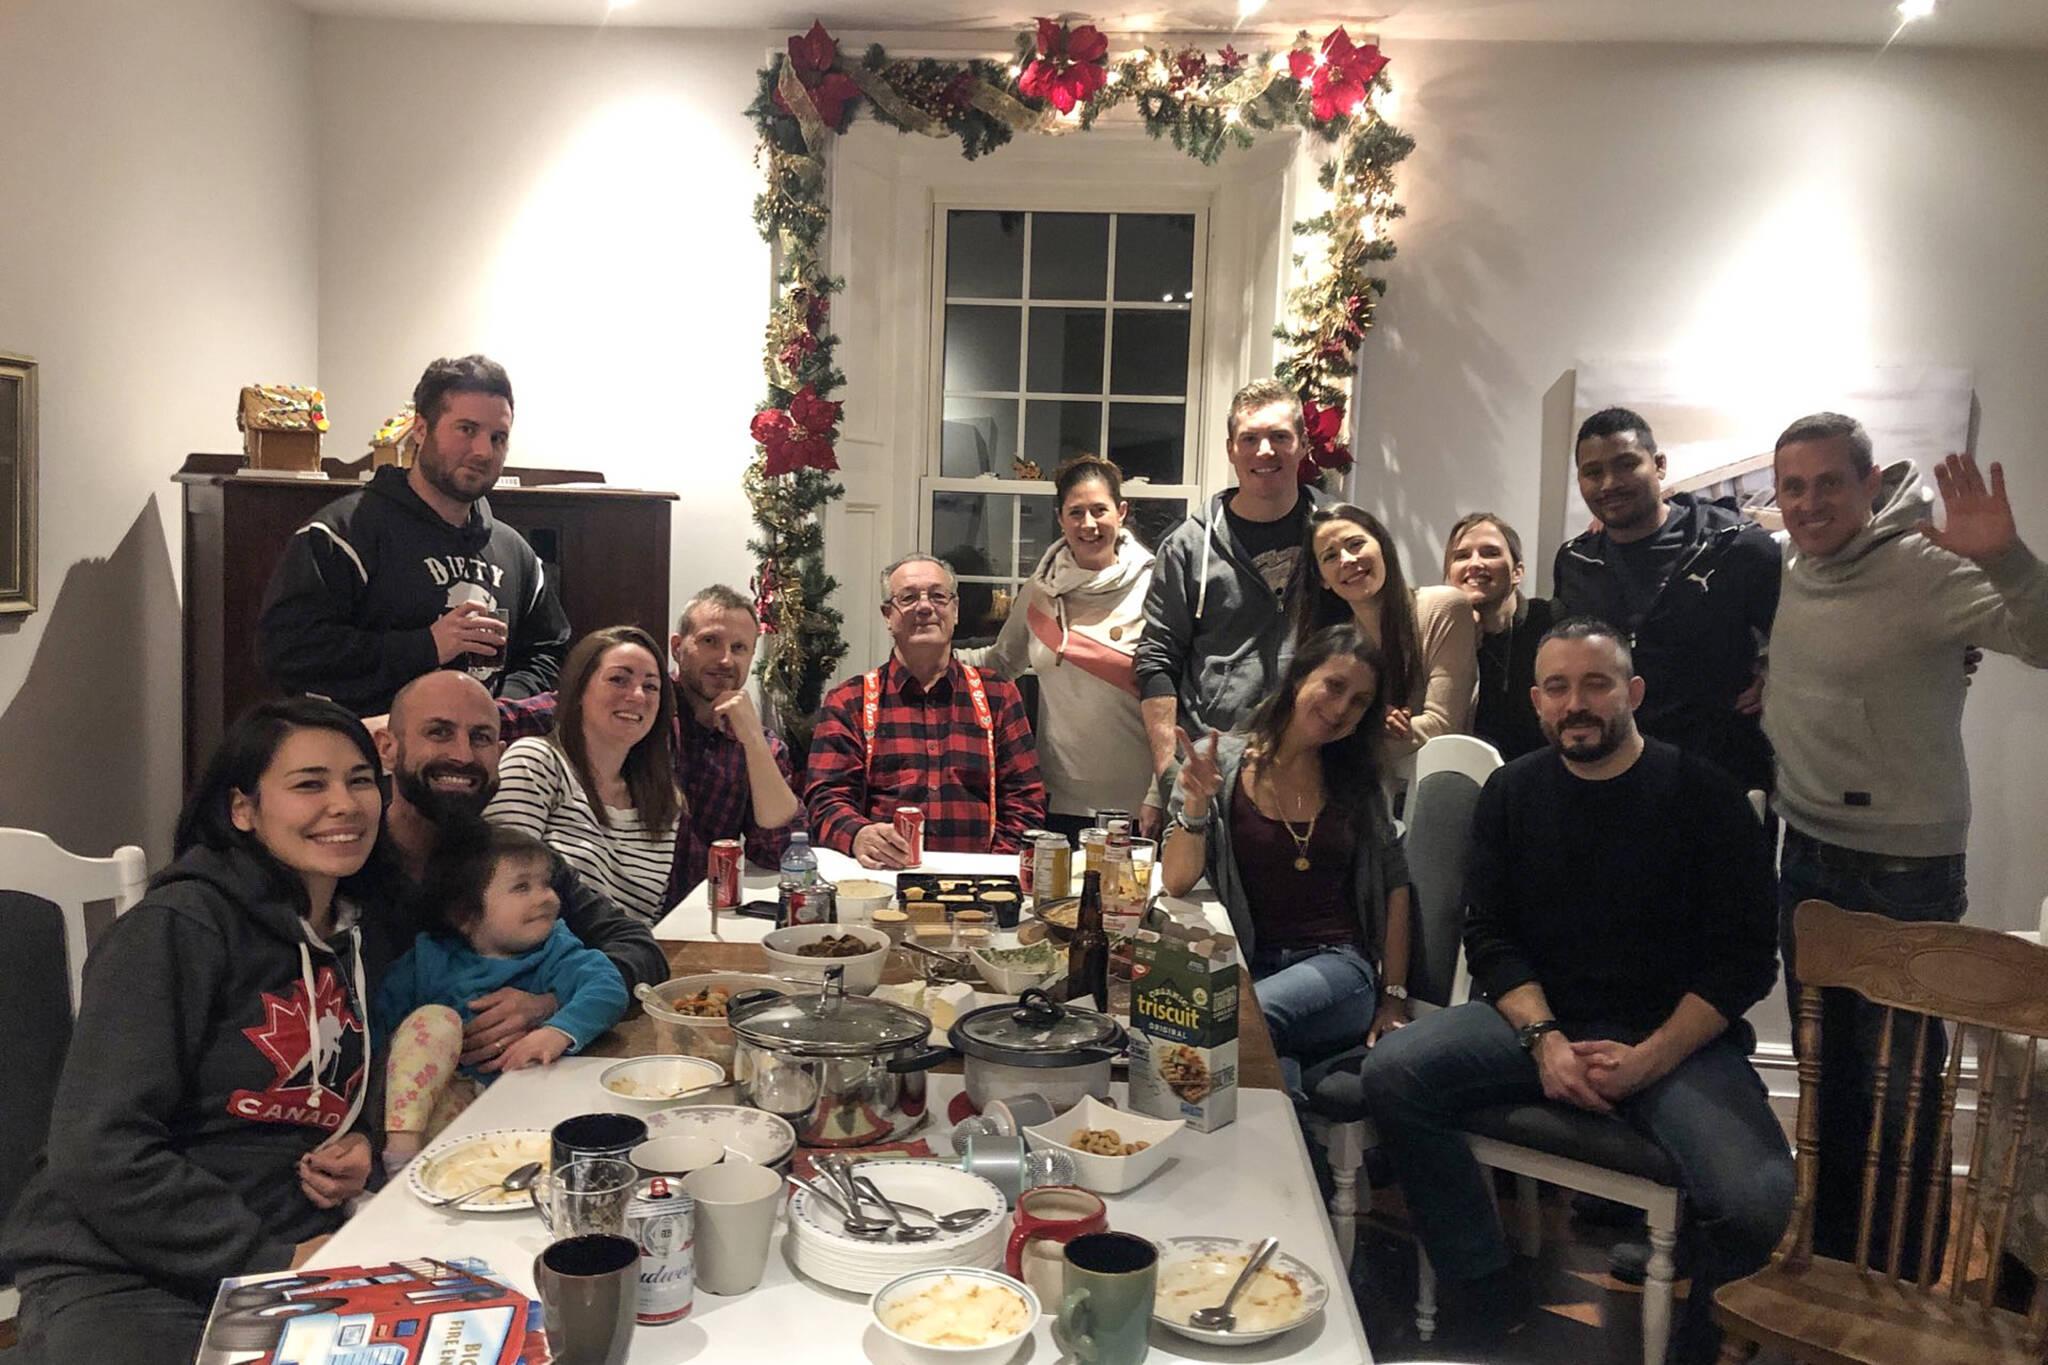 randy hillier christmas photo